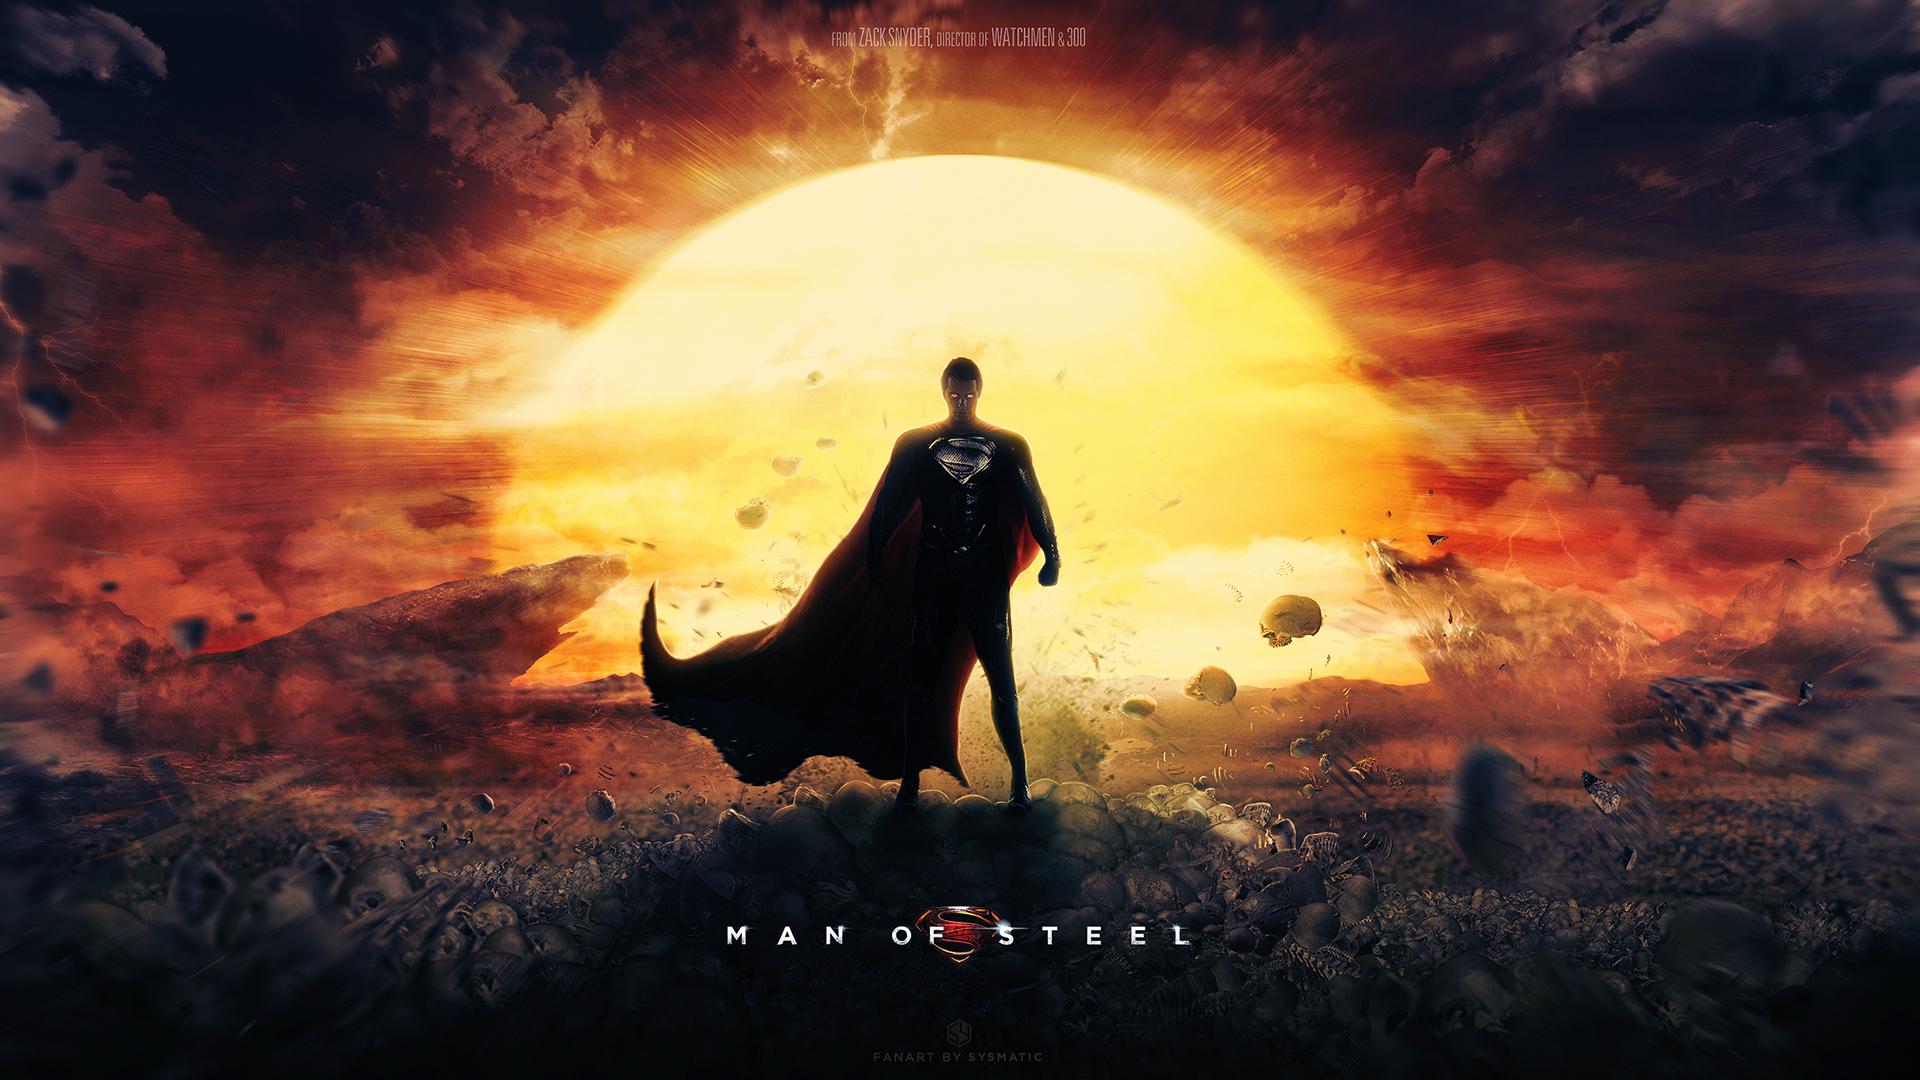 Man of Steel   Dreamstate wallpaper by visuasys 1920x1080